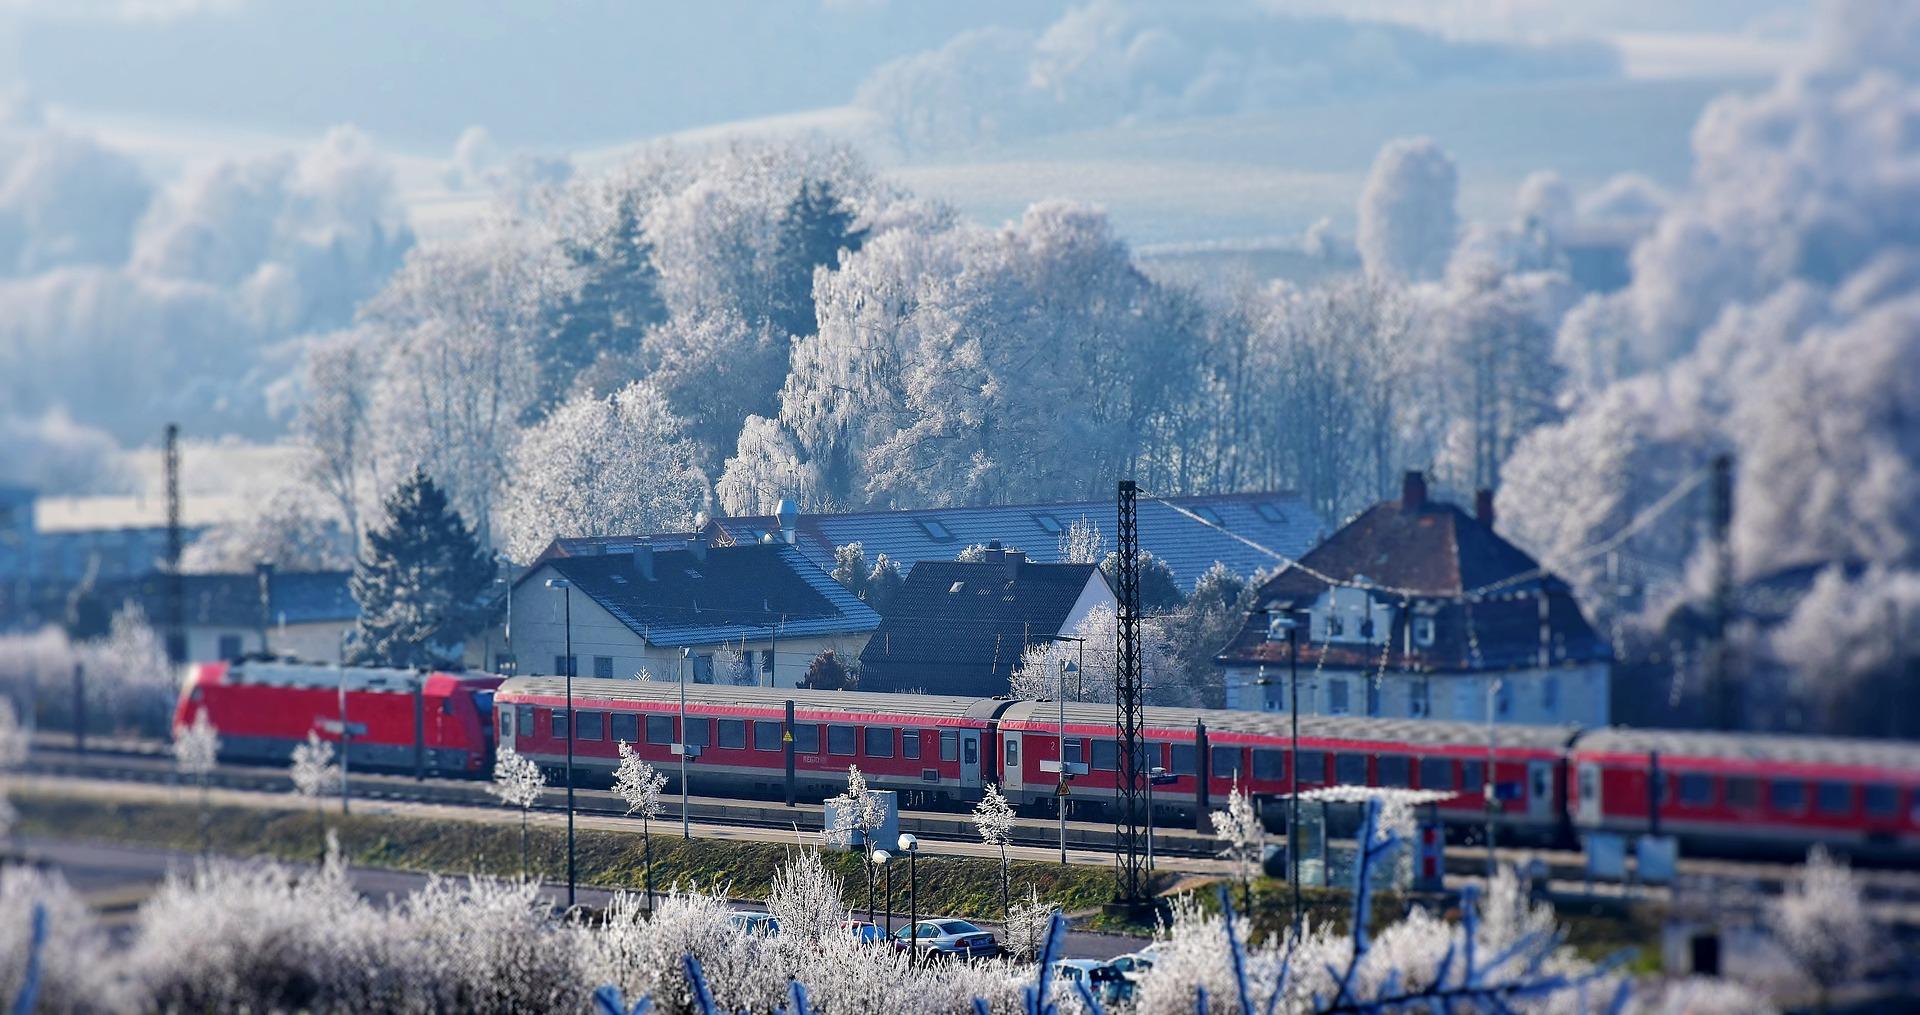 train-2947086_1920.jpg